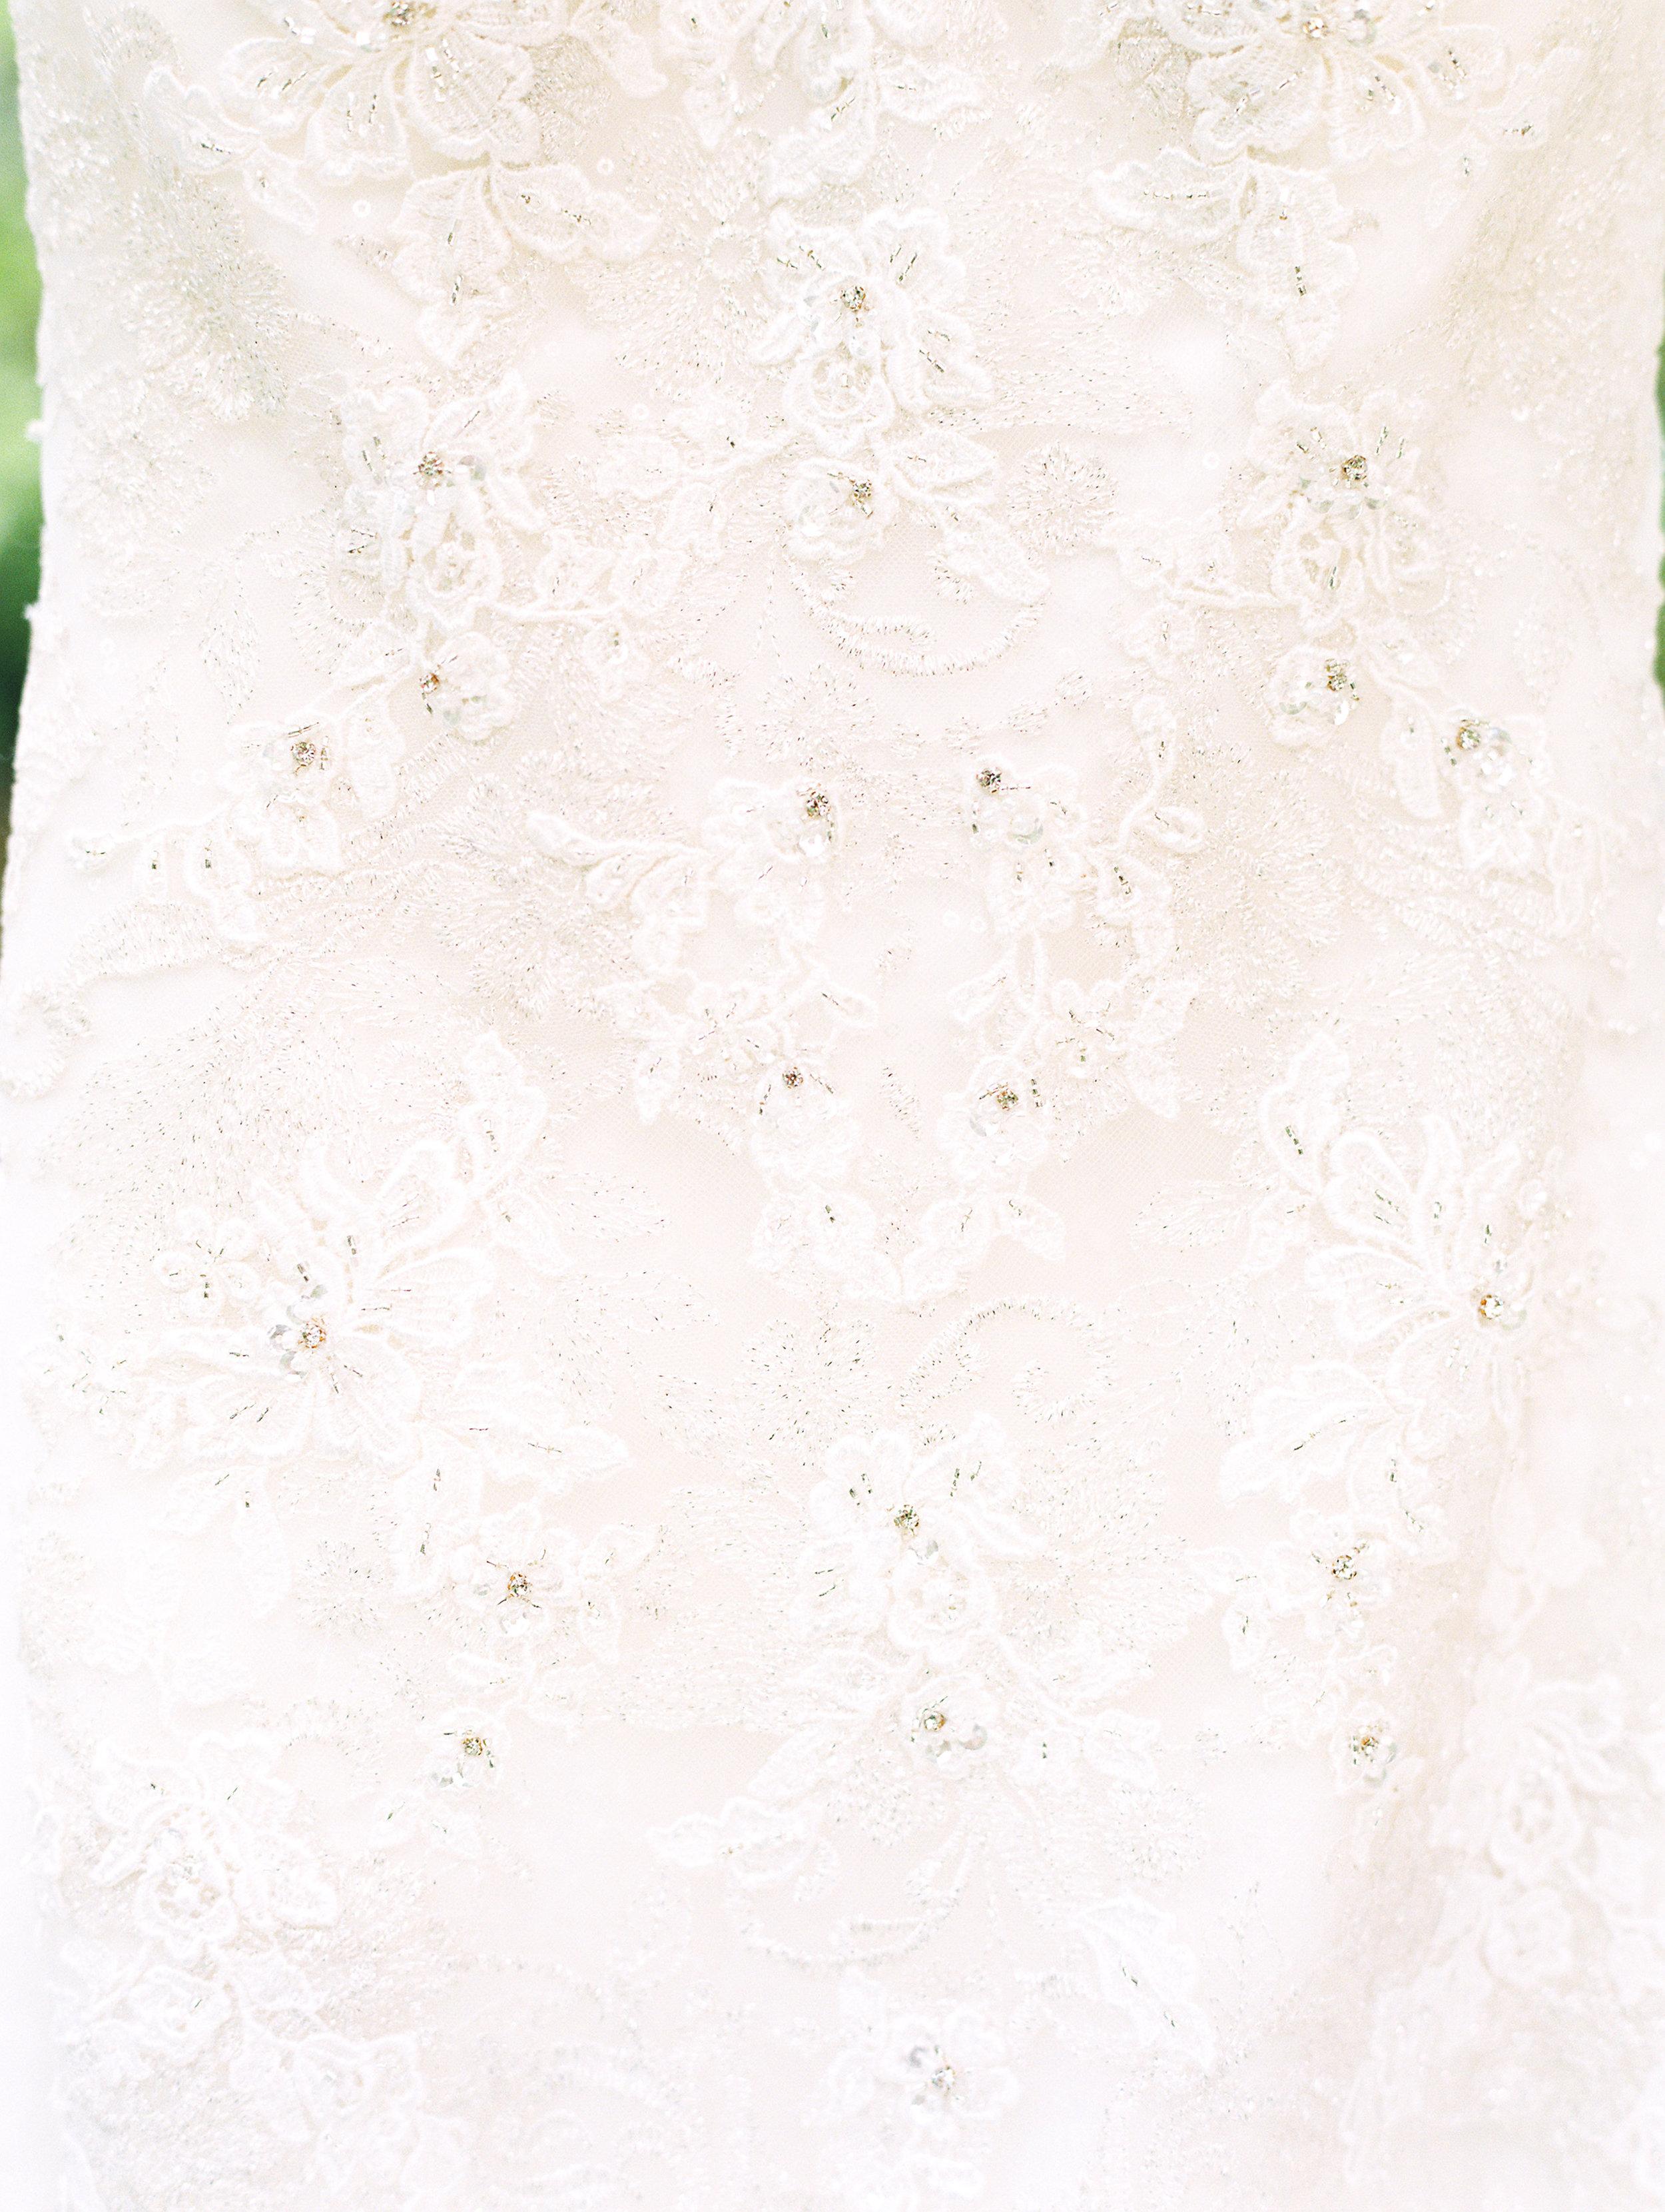 Conger+Wedding+Details-24.jpg